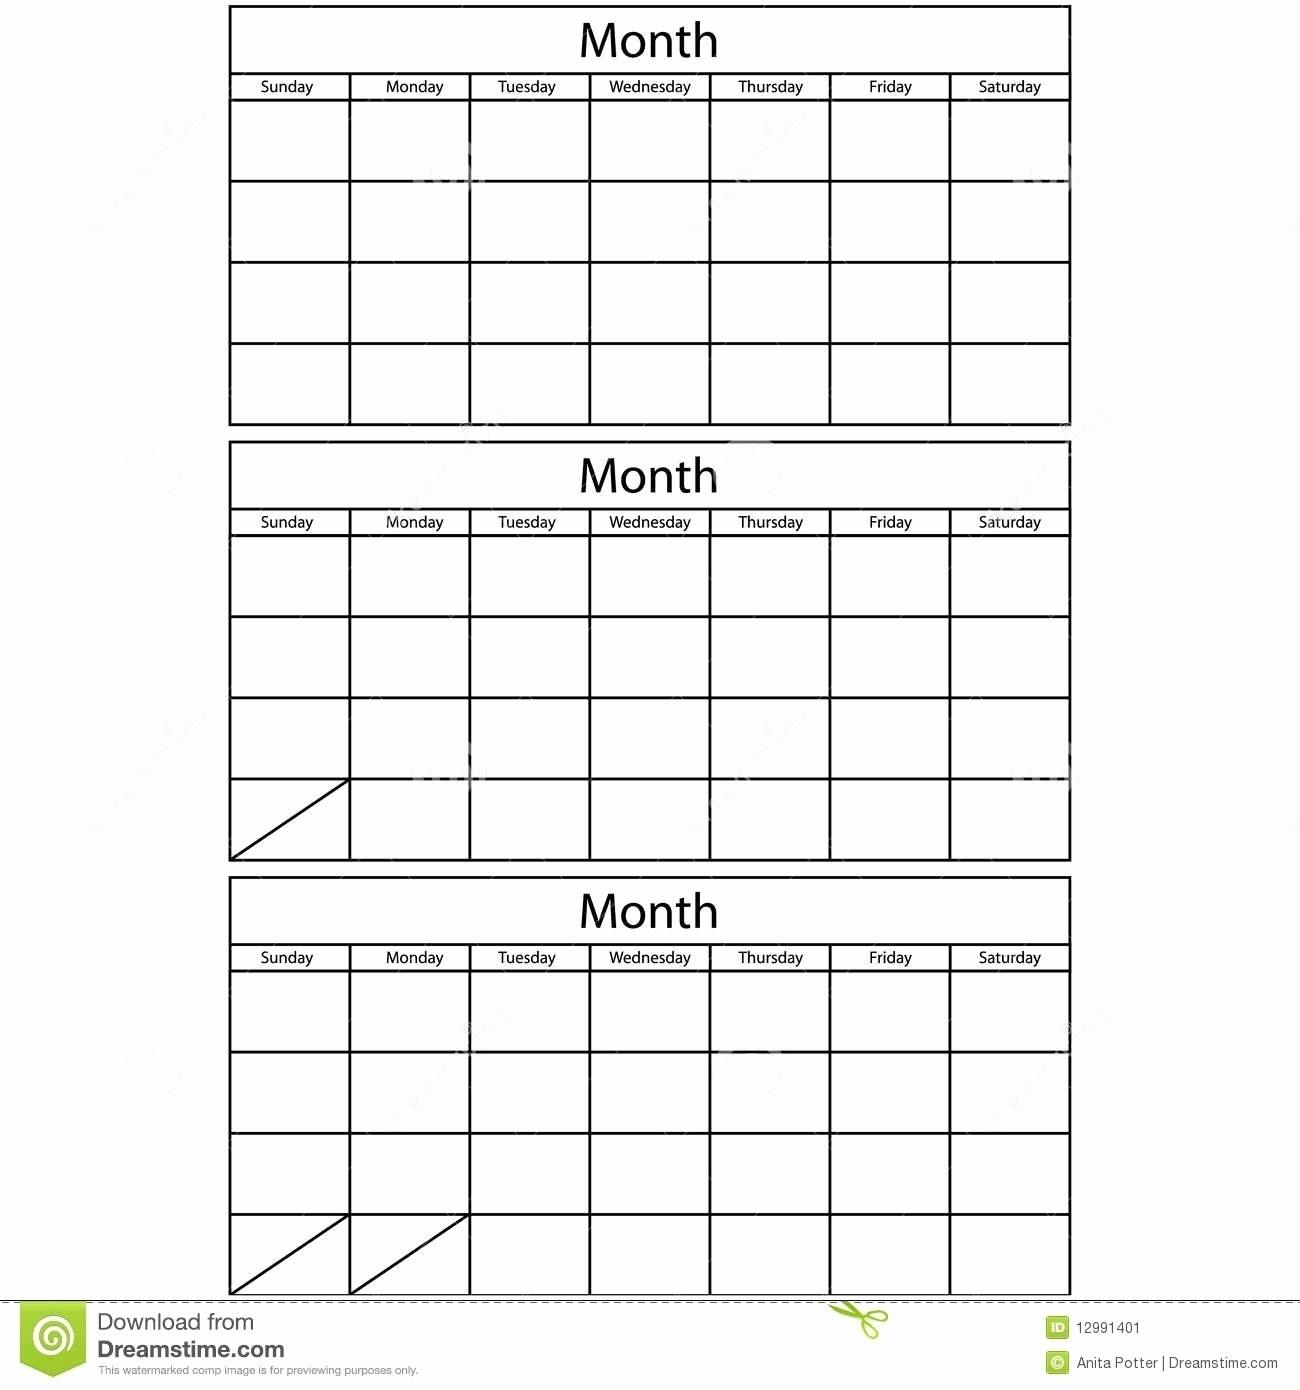 Free 3 Month Calendar Templates - Calendar Inspiration Design